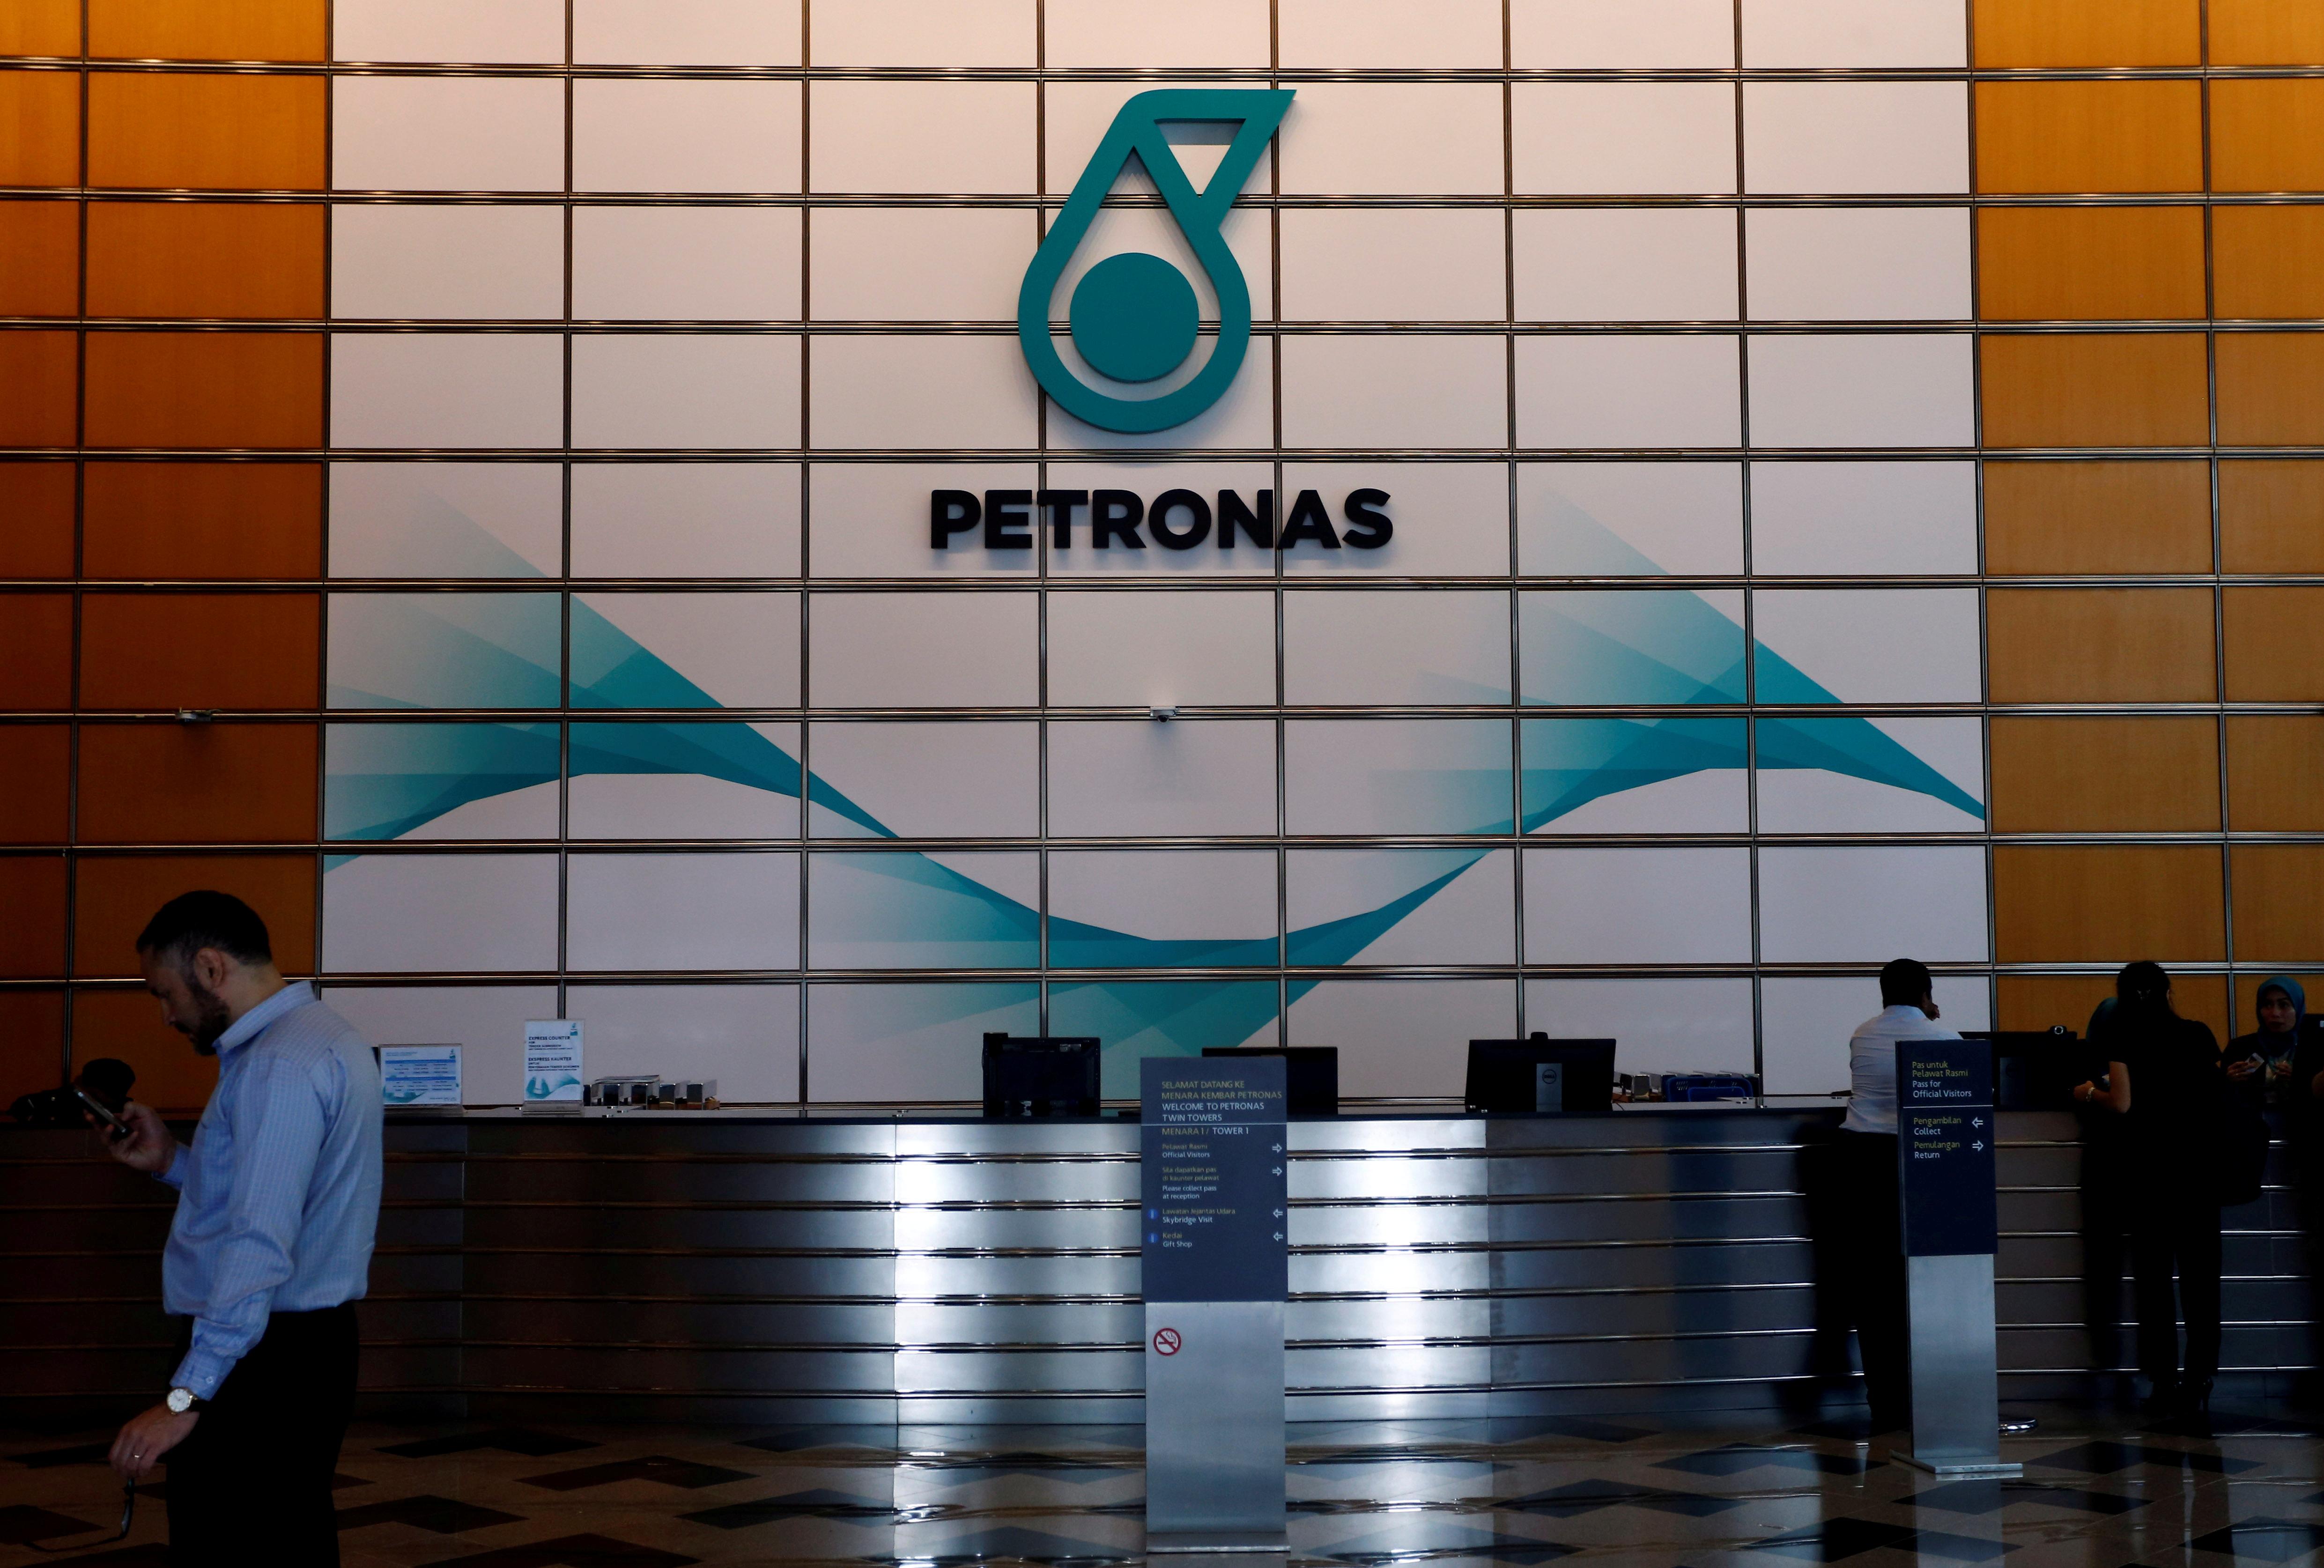 A Petronas logo at their office in Kuala Lumpur, Malaysia August 15, 2017. REUTERS/Lai Seng Sin/File Photo